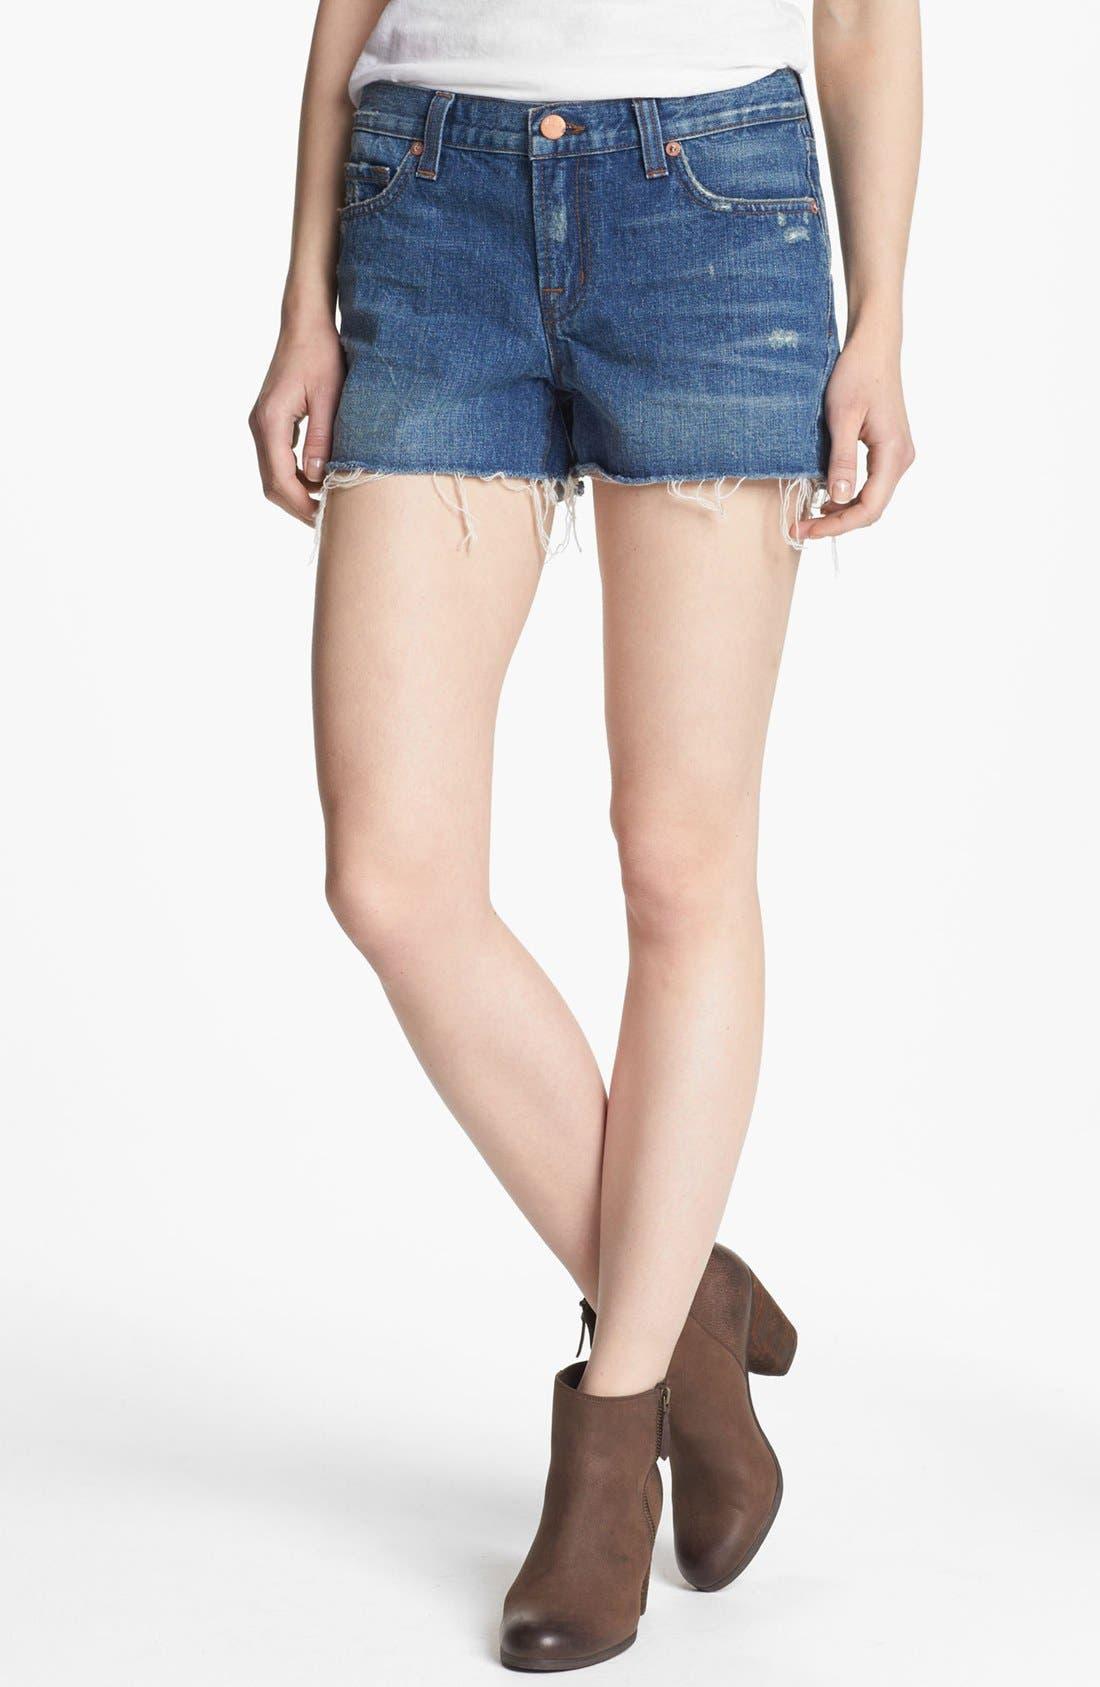 Alternate Image 1 Selected - J Brand Cutoff Denim Shorts (Libra)